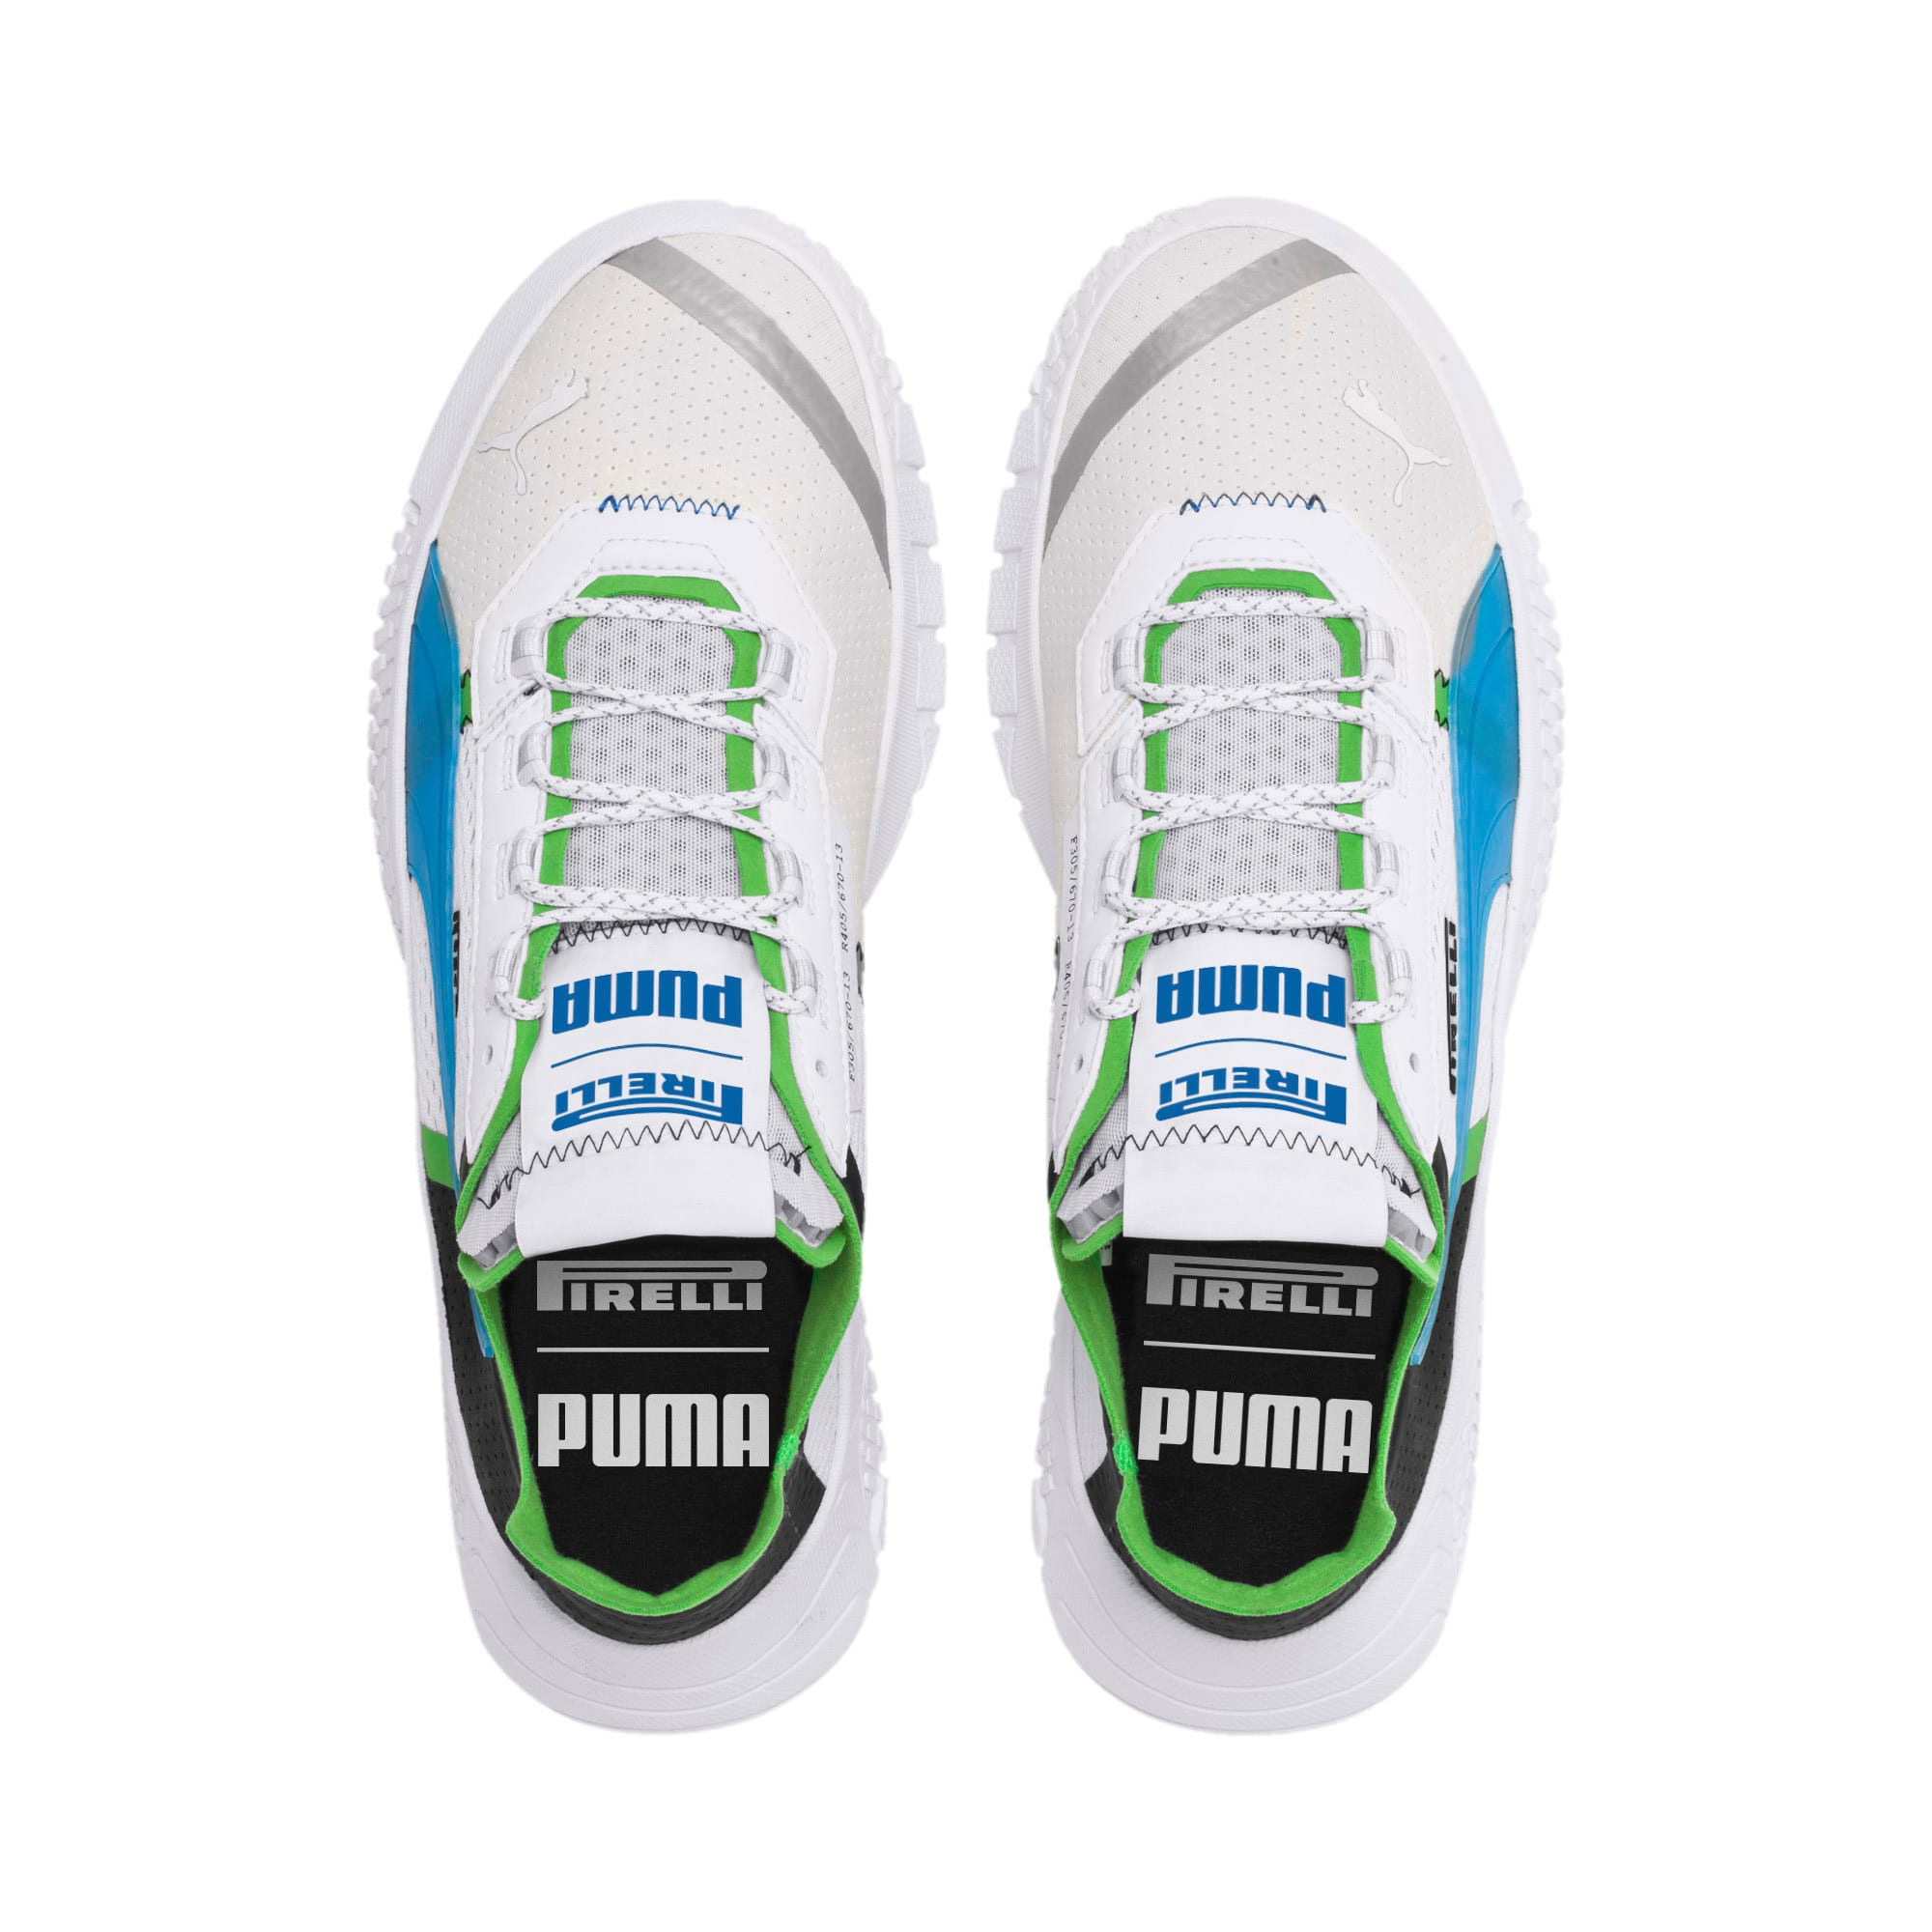 Thumbnail 7 of Replicat-X Pirelli Motorsport Shoes, White-Black-Classic Green, medium